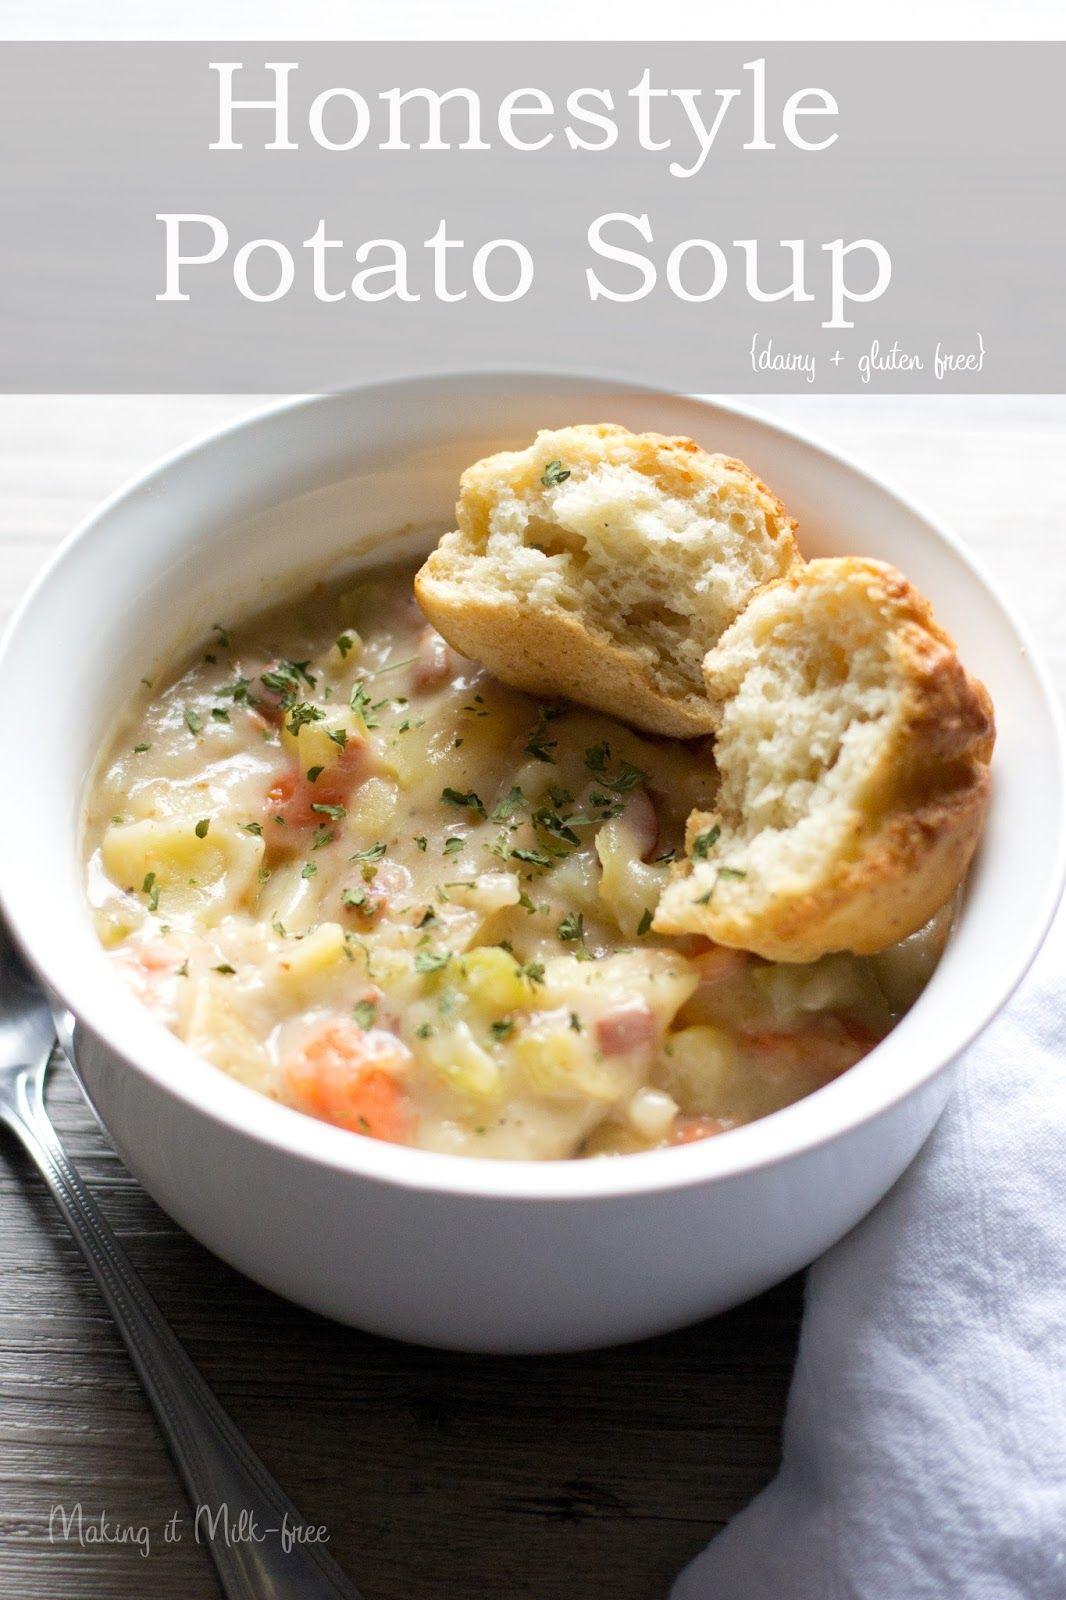 Homestyle Potato Soup | Recipe | Gluten-free Soups & Stews ...